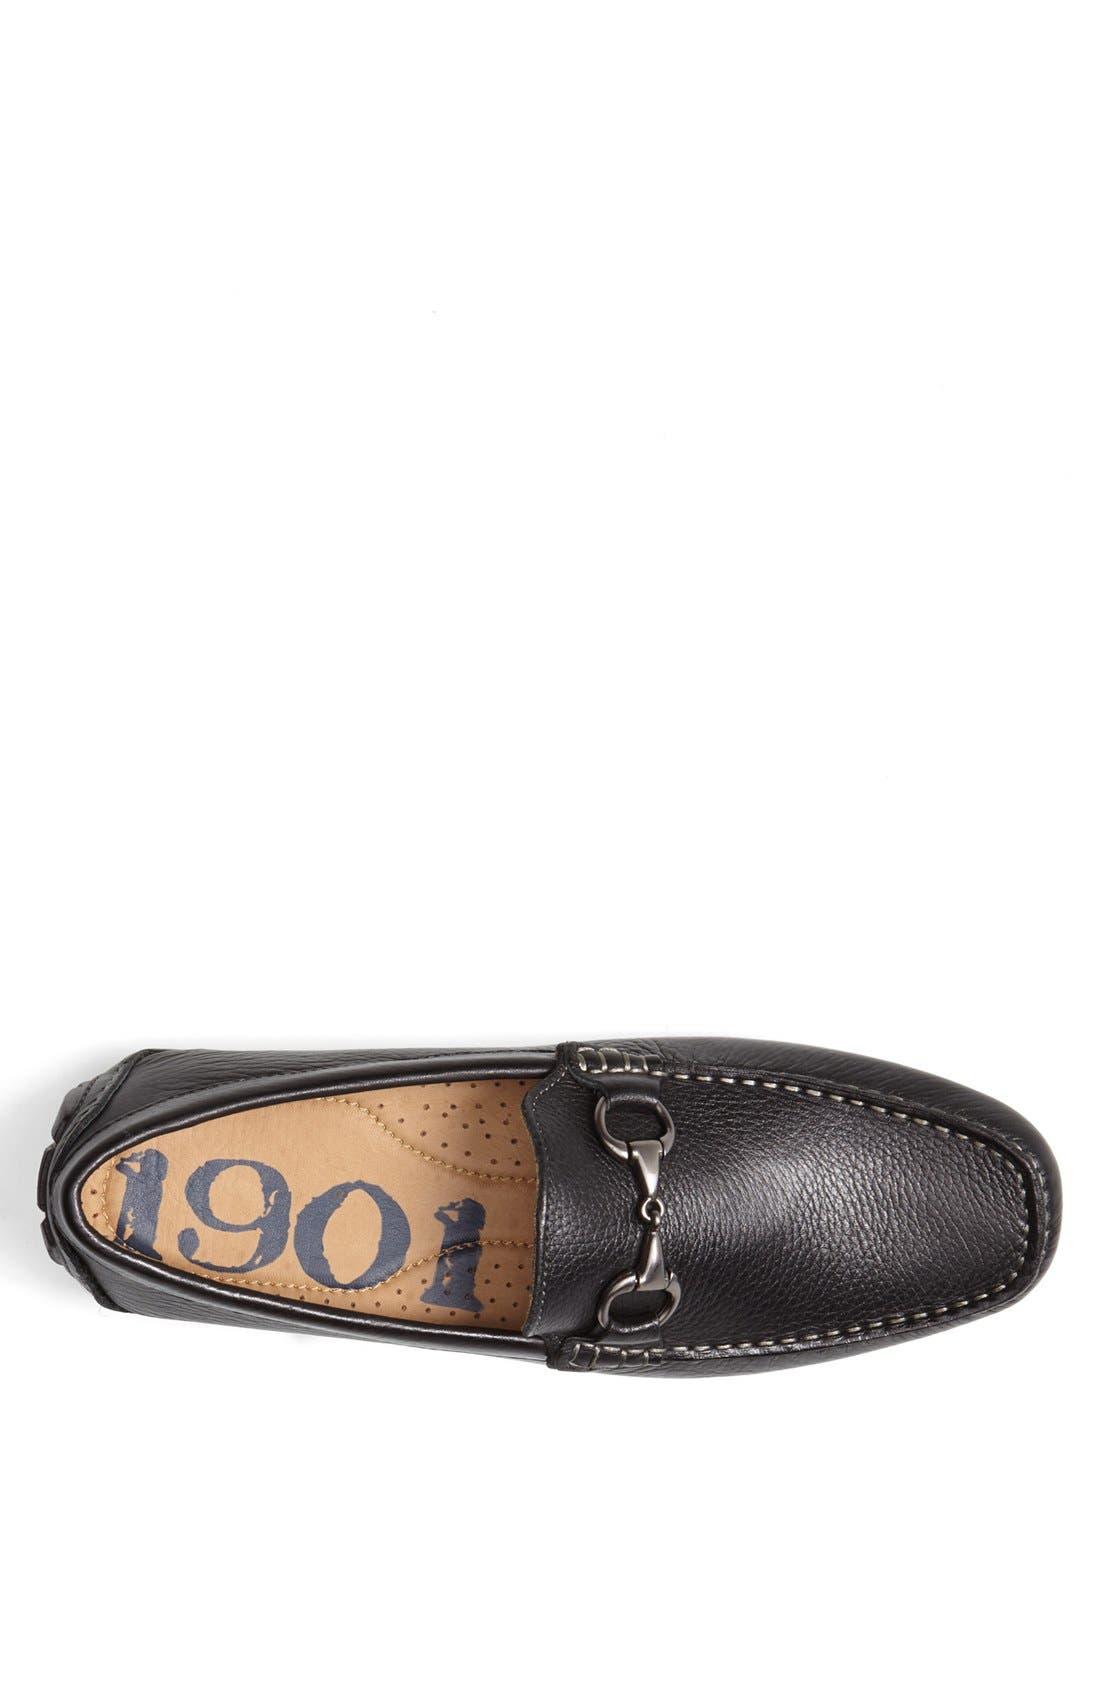 Alternate Image 3  - 1901 'Naples' Driving Shoe (Men)